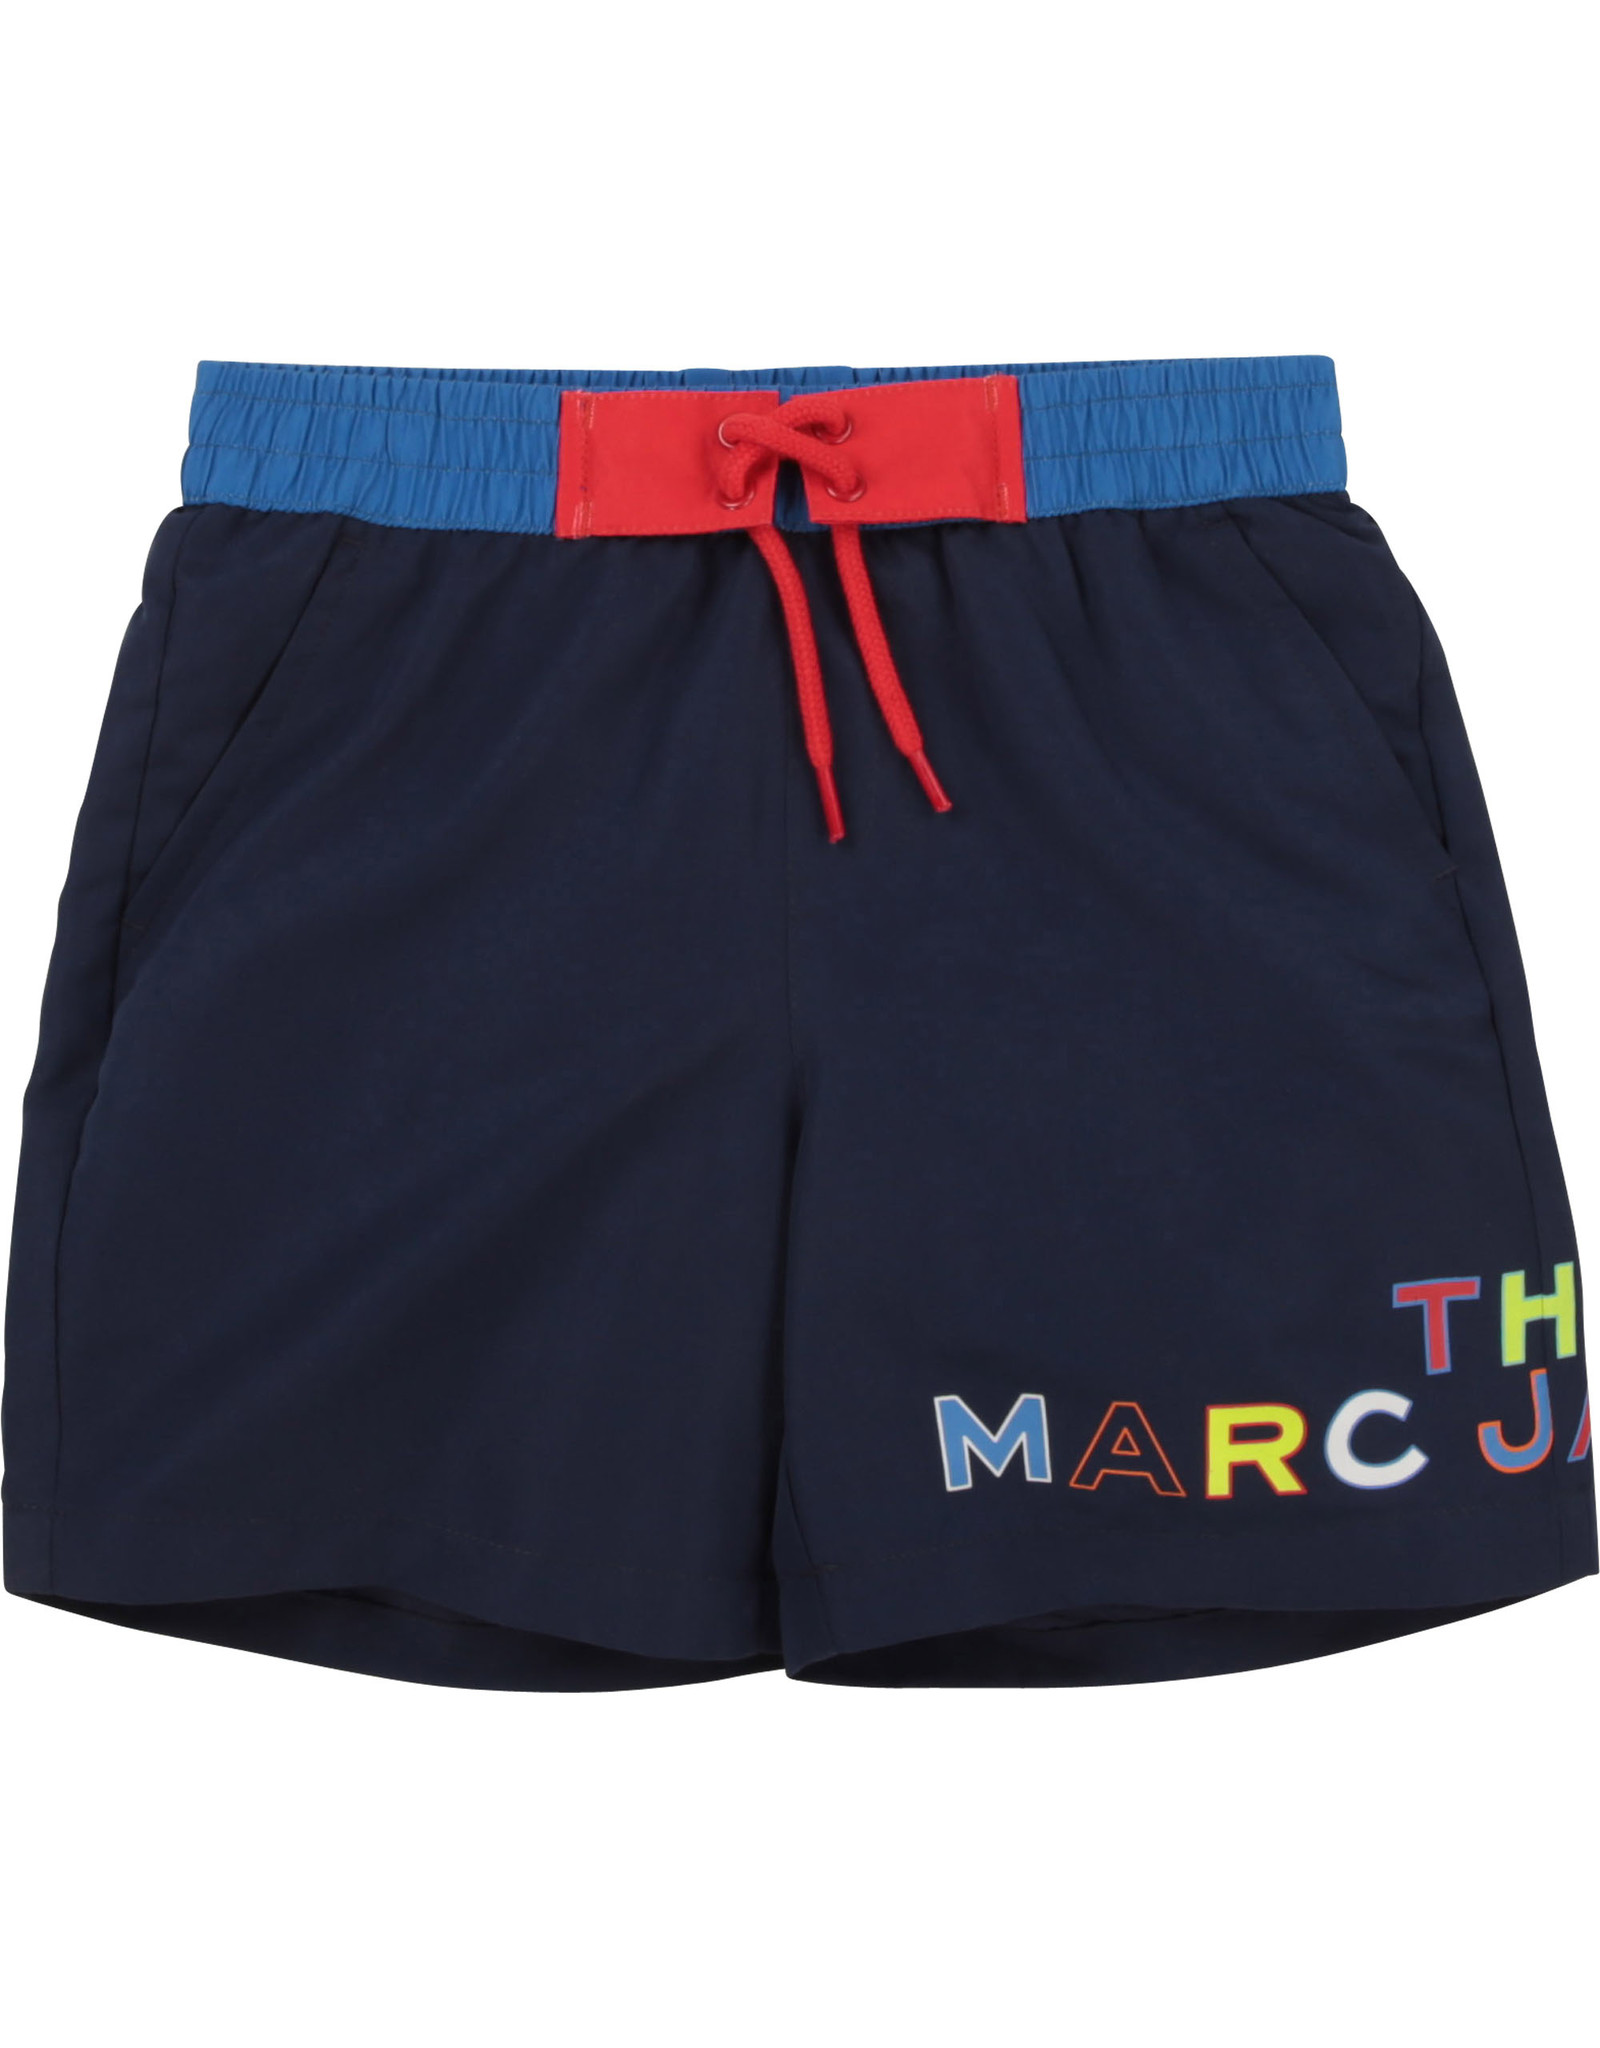 The Marc Jacobs TMJ SS21 W20062 zwembroek